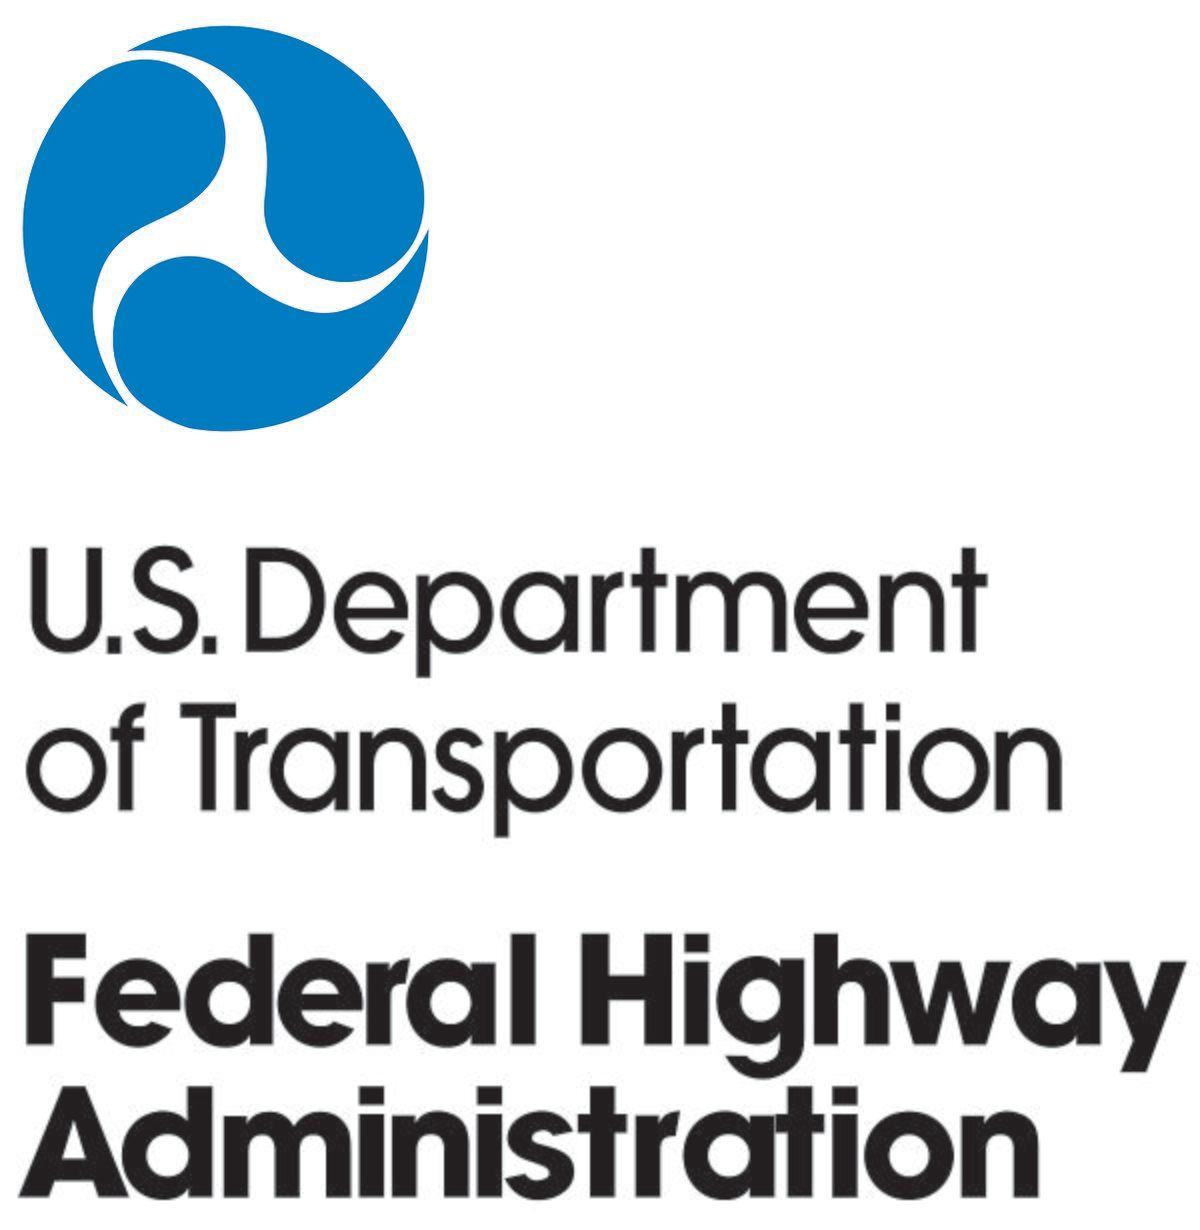 U.S. Department of Transportation, Federal Highway Administration